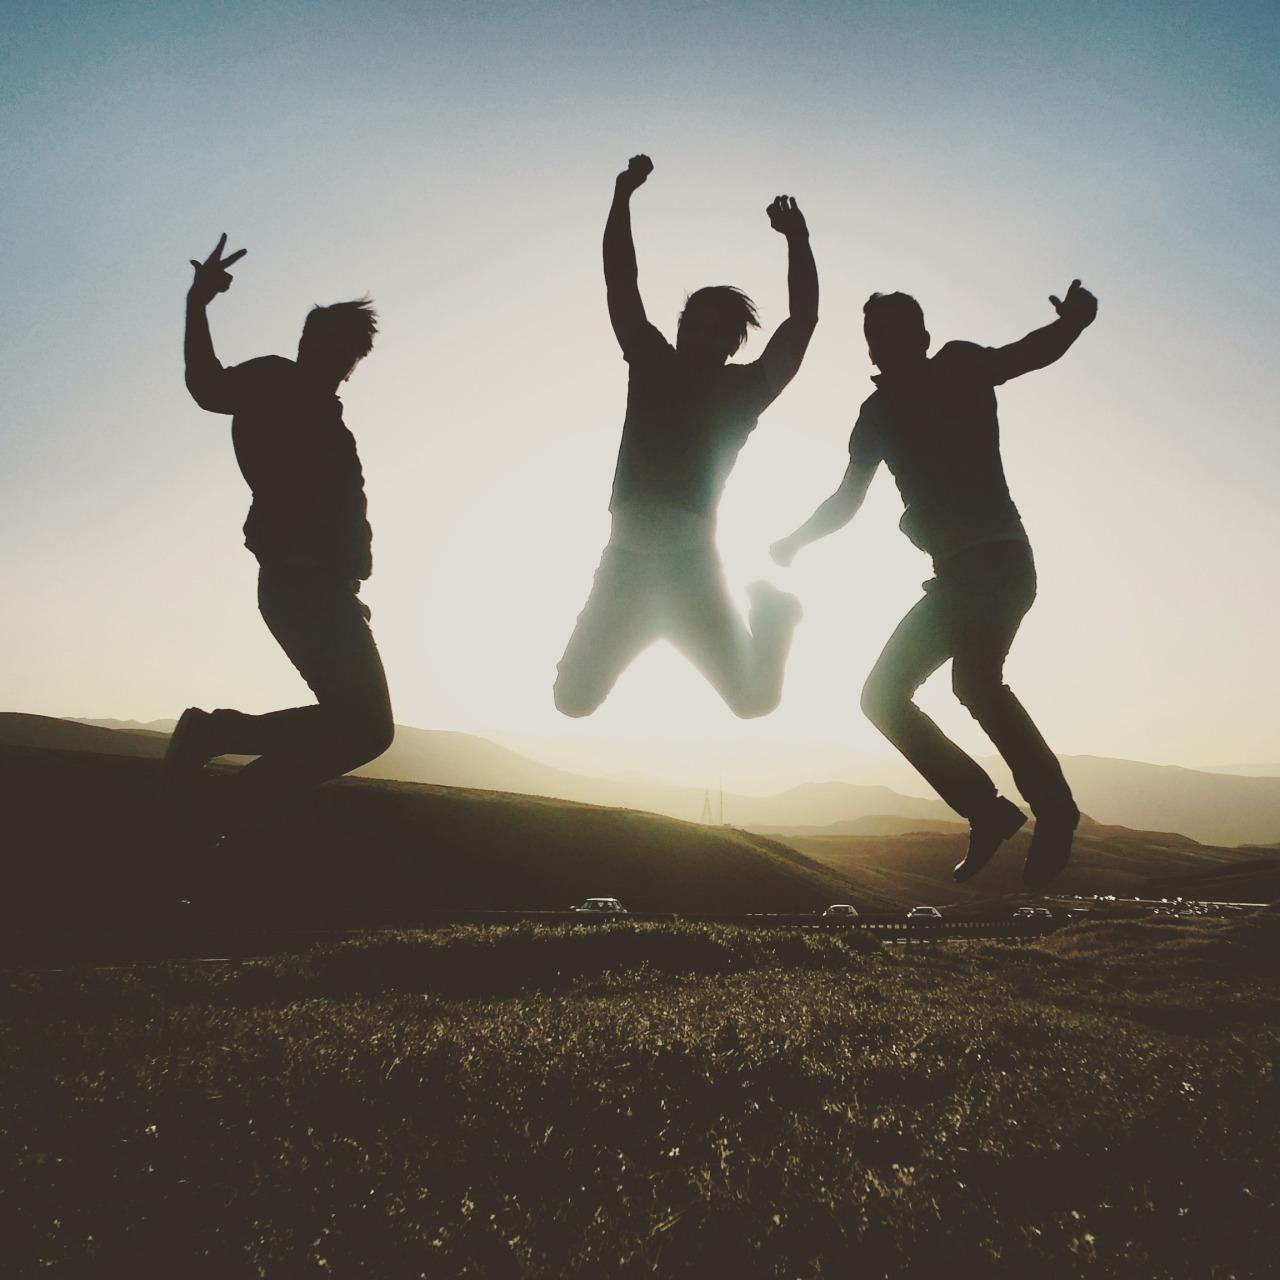 Guys jumping for joy